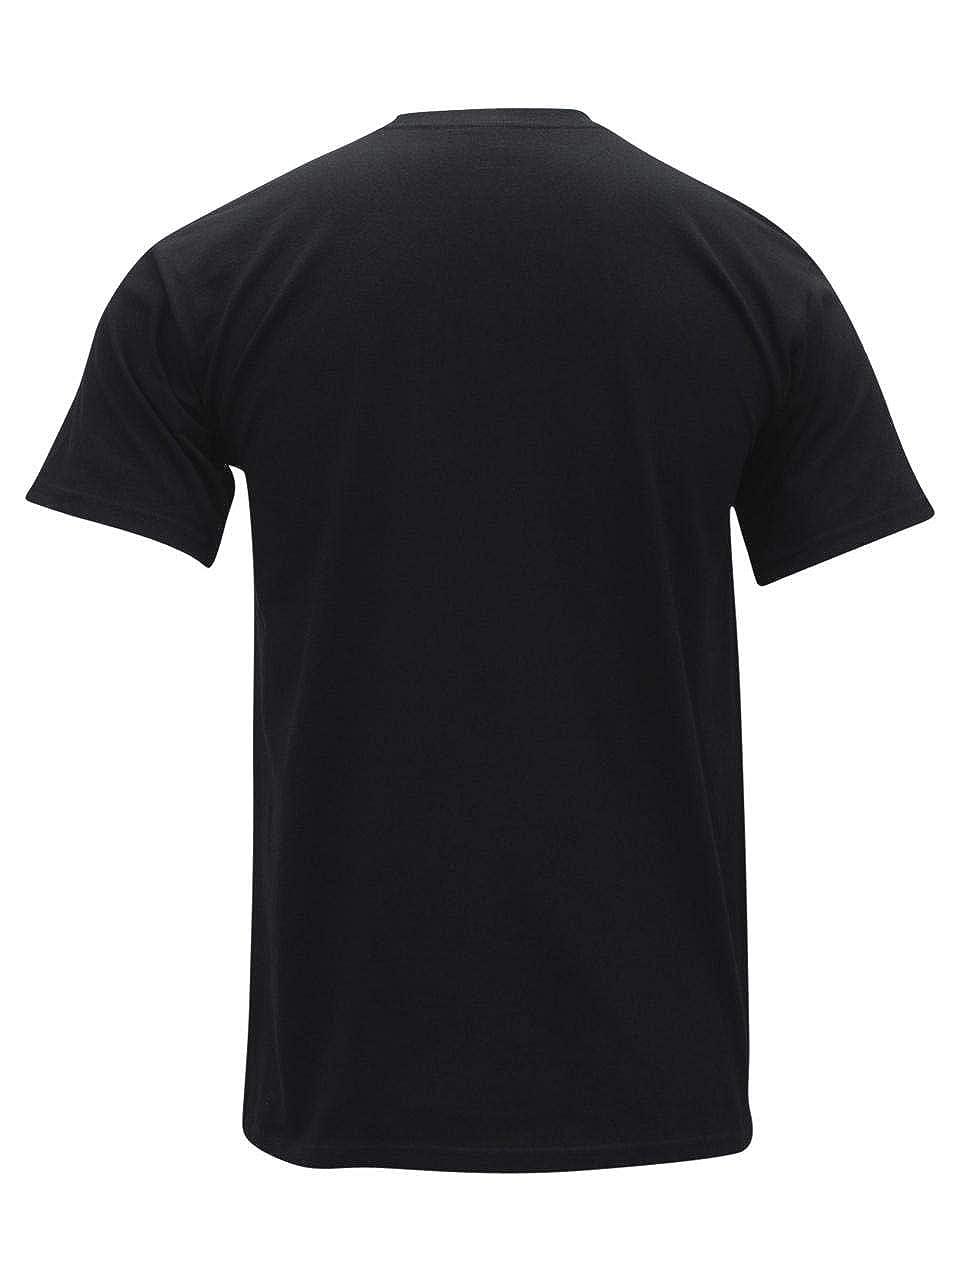 293f651284 Amazon.com: Fila Men's Printed Tee: Clothing